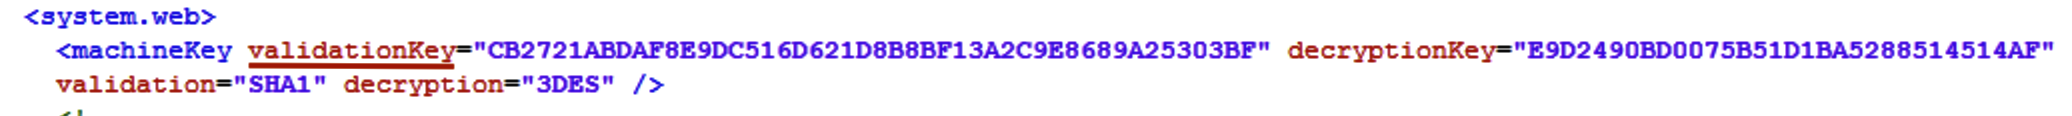 web.config file fragment